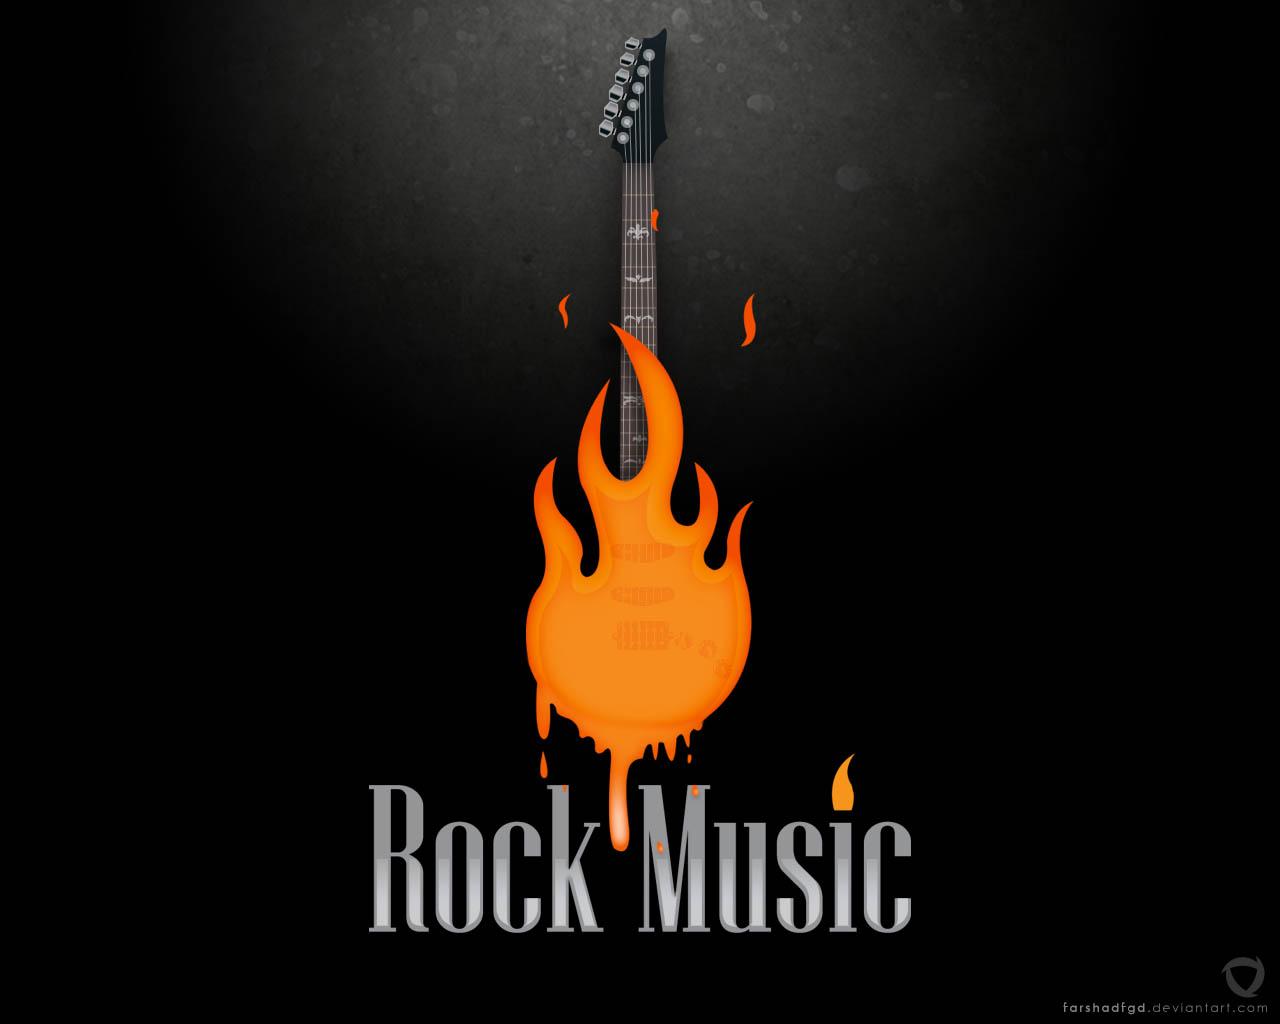 Music Rock Wallpaper 15532 Hd Wallpapers in Music   Imagescicom 1280x1024